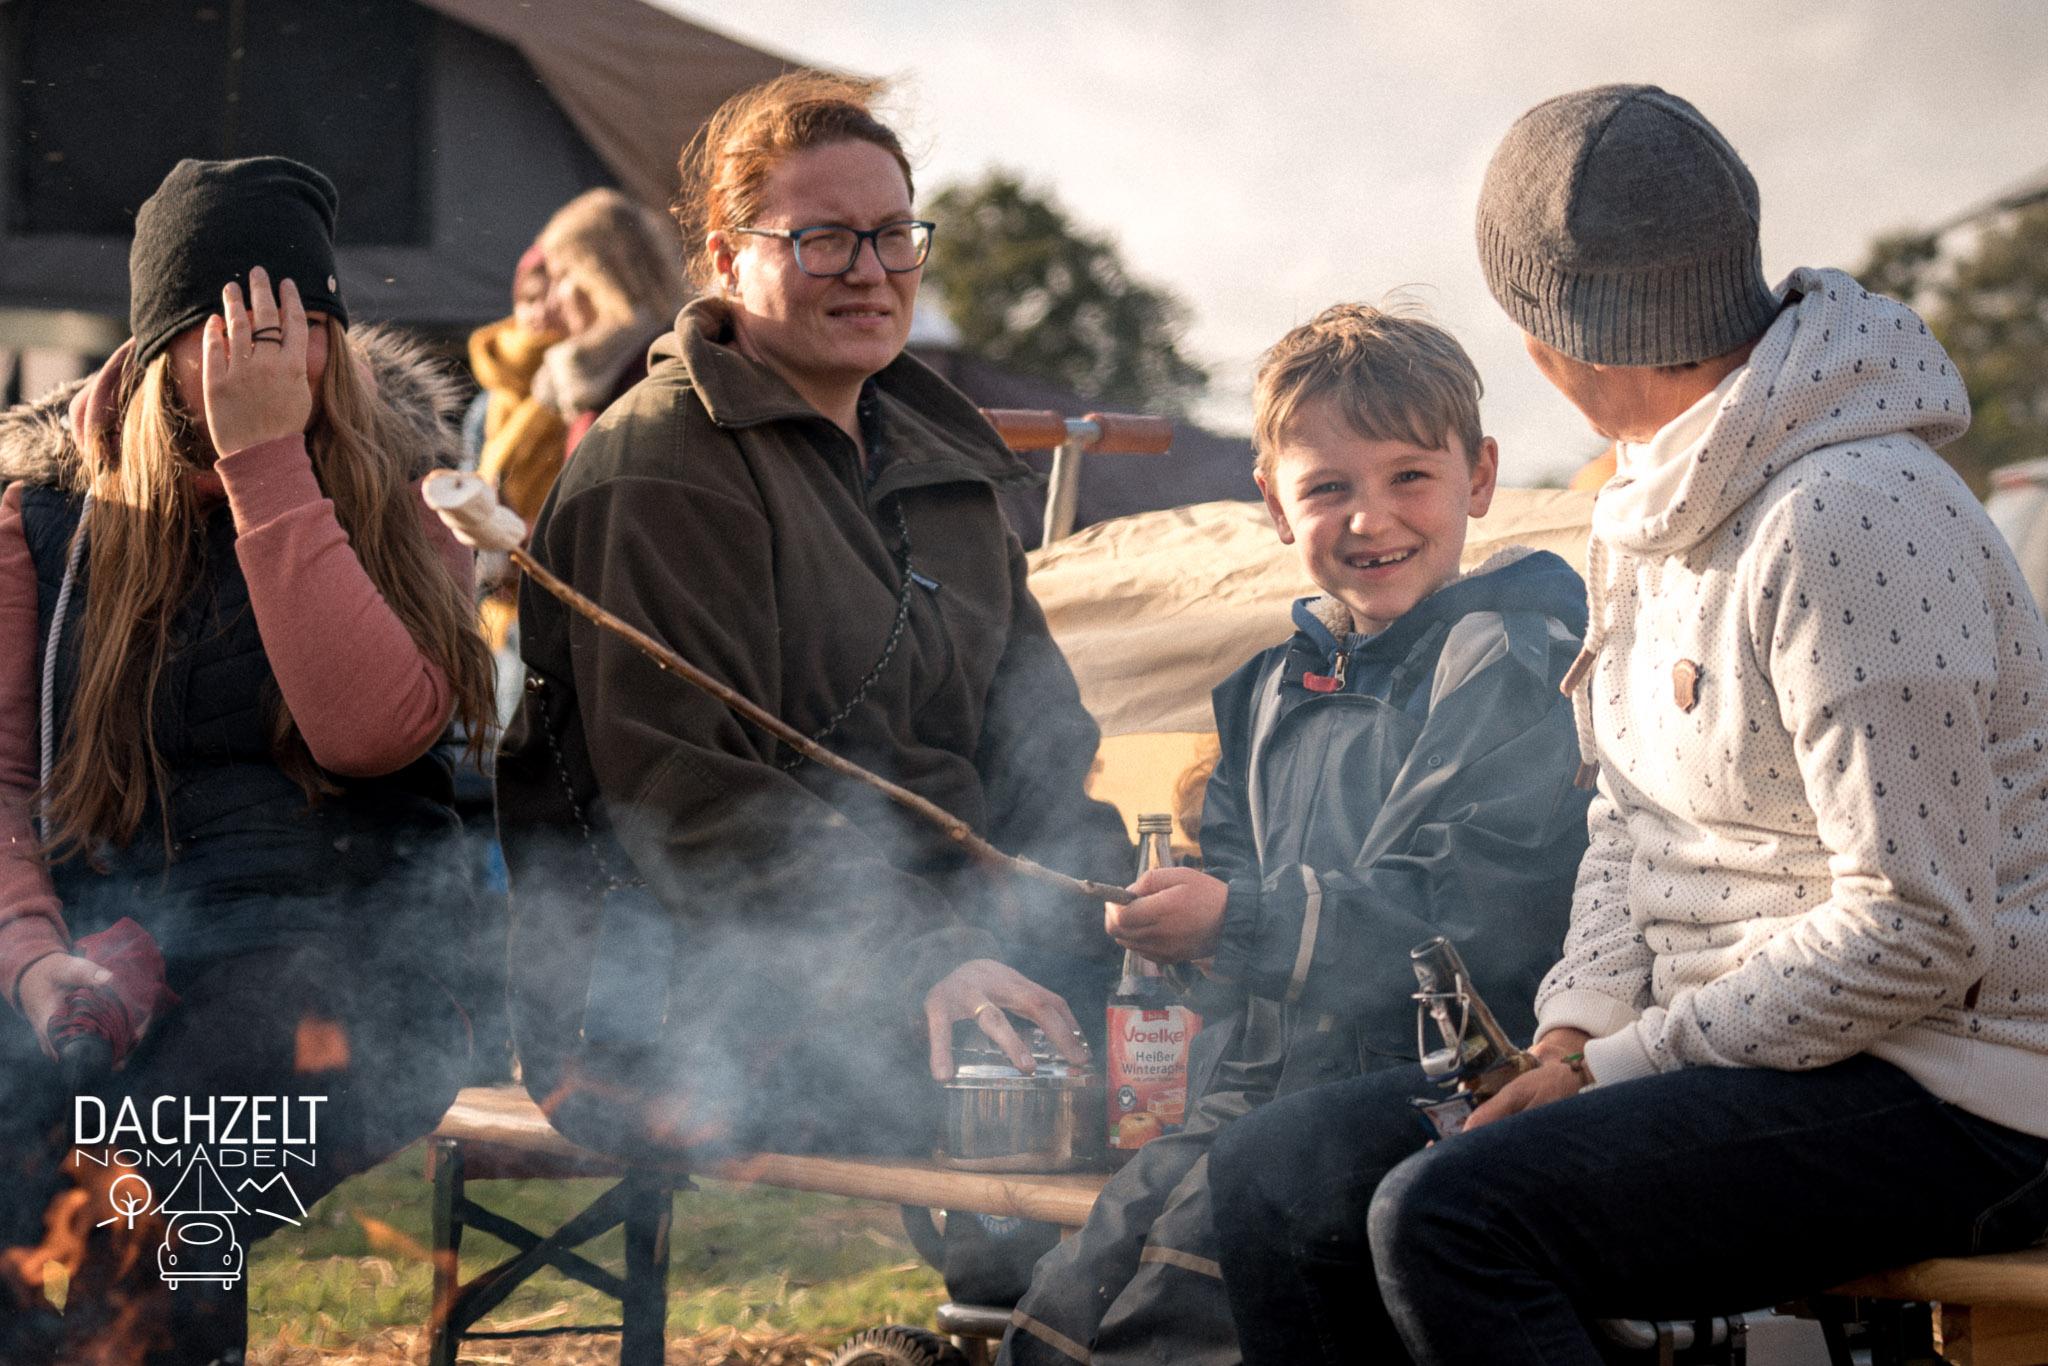 20191019-Dachzelt-Camp-Speciaal-Florian-Keuten-FLK05474